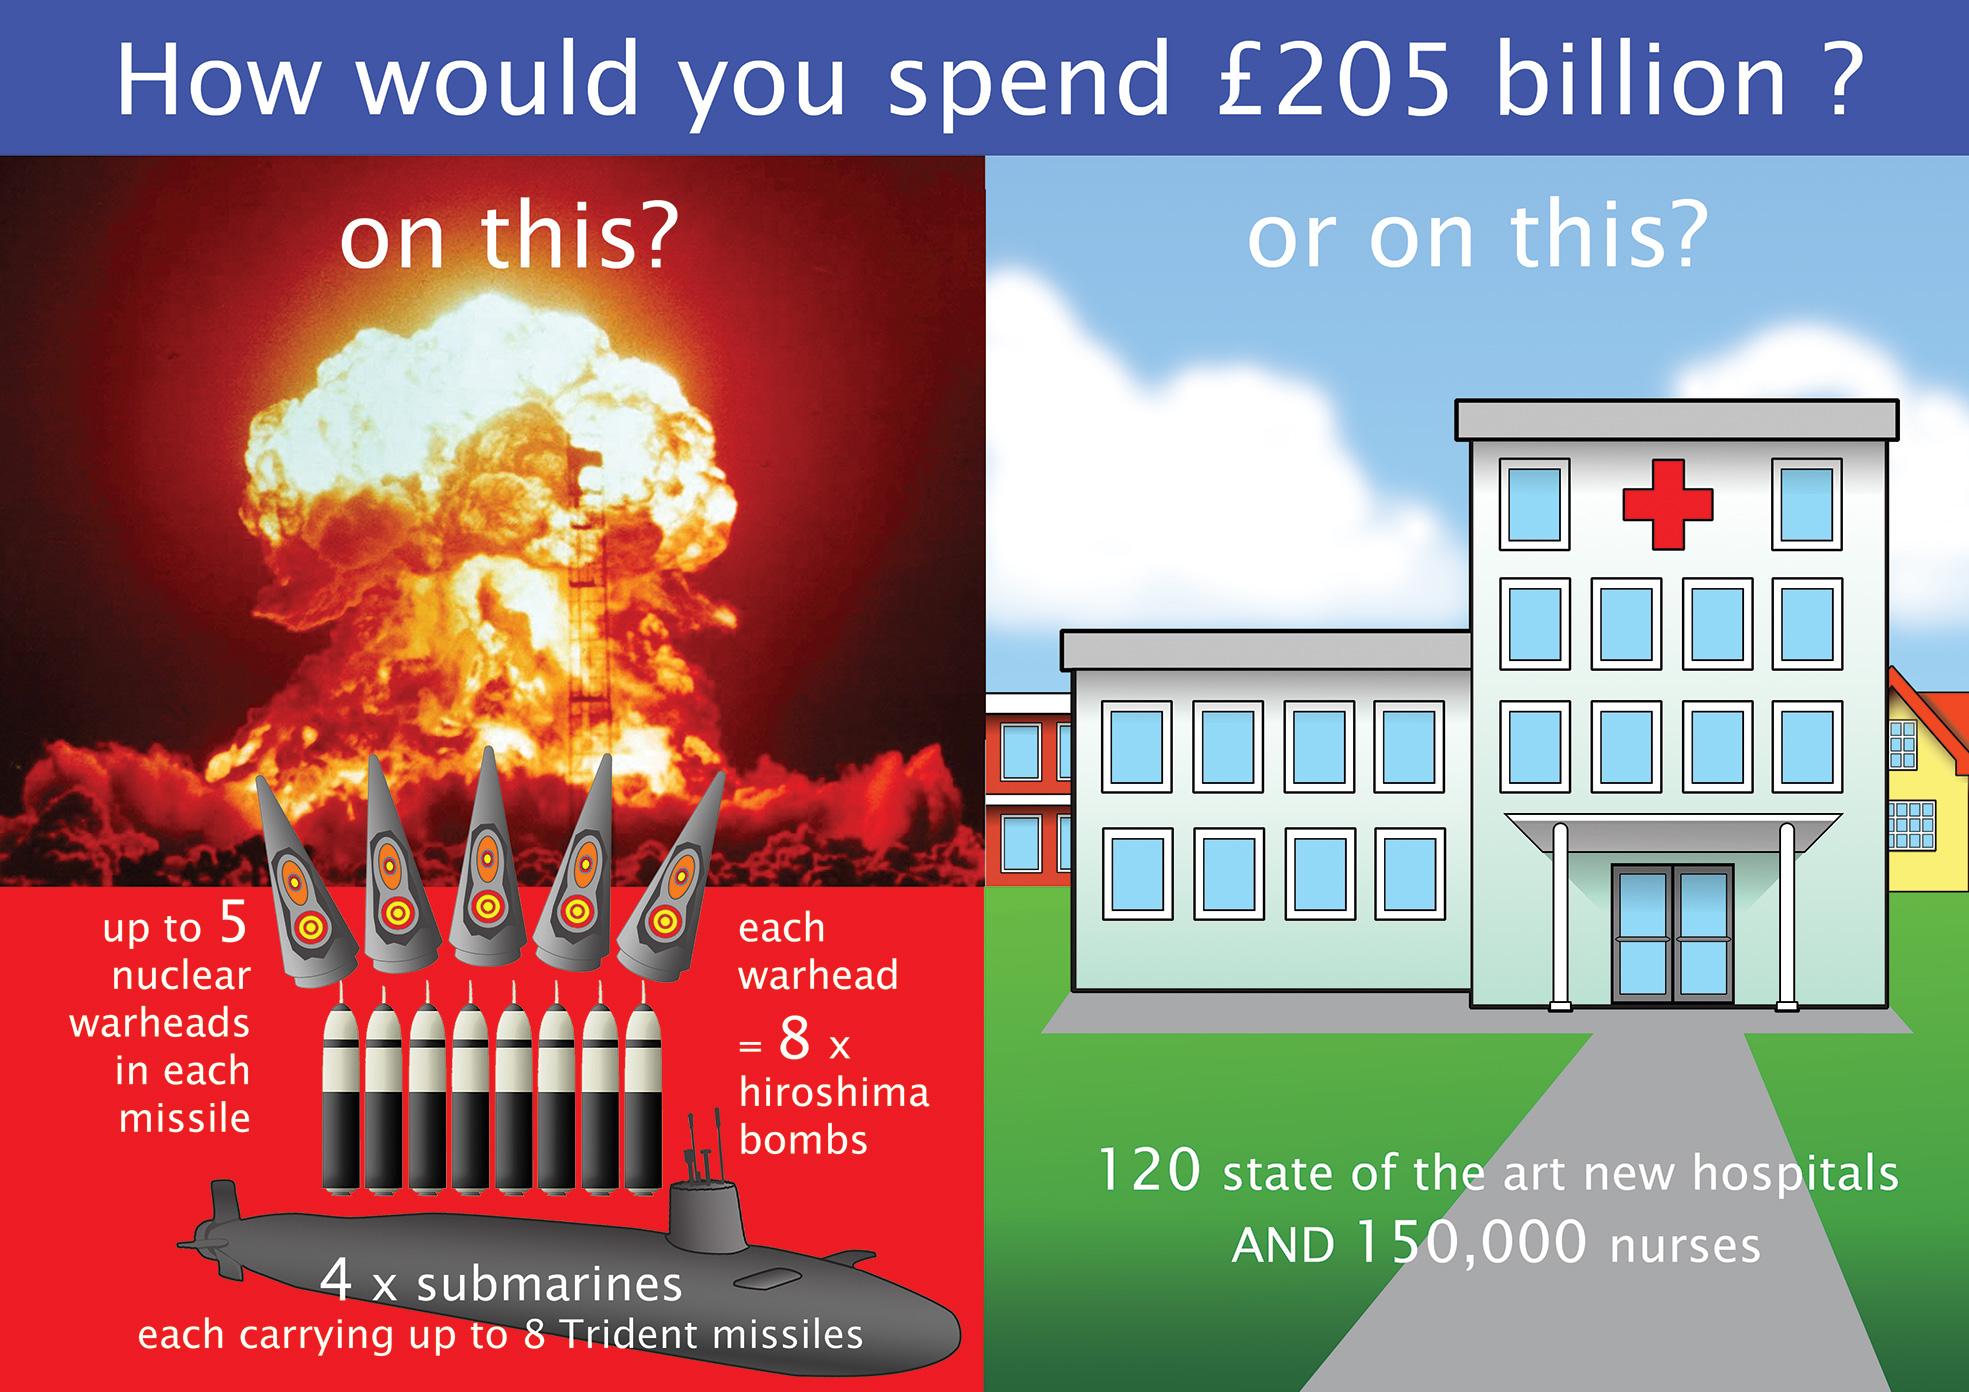 Download Infographic - Download Infographic, created by Lis Fields.